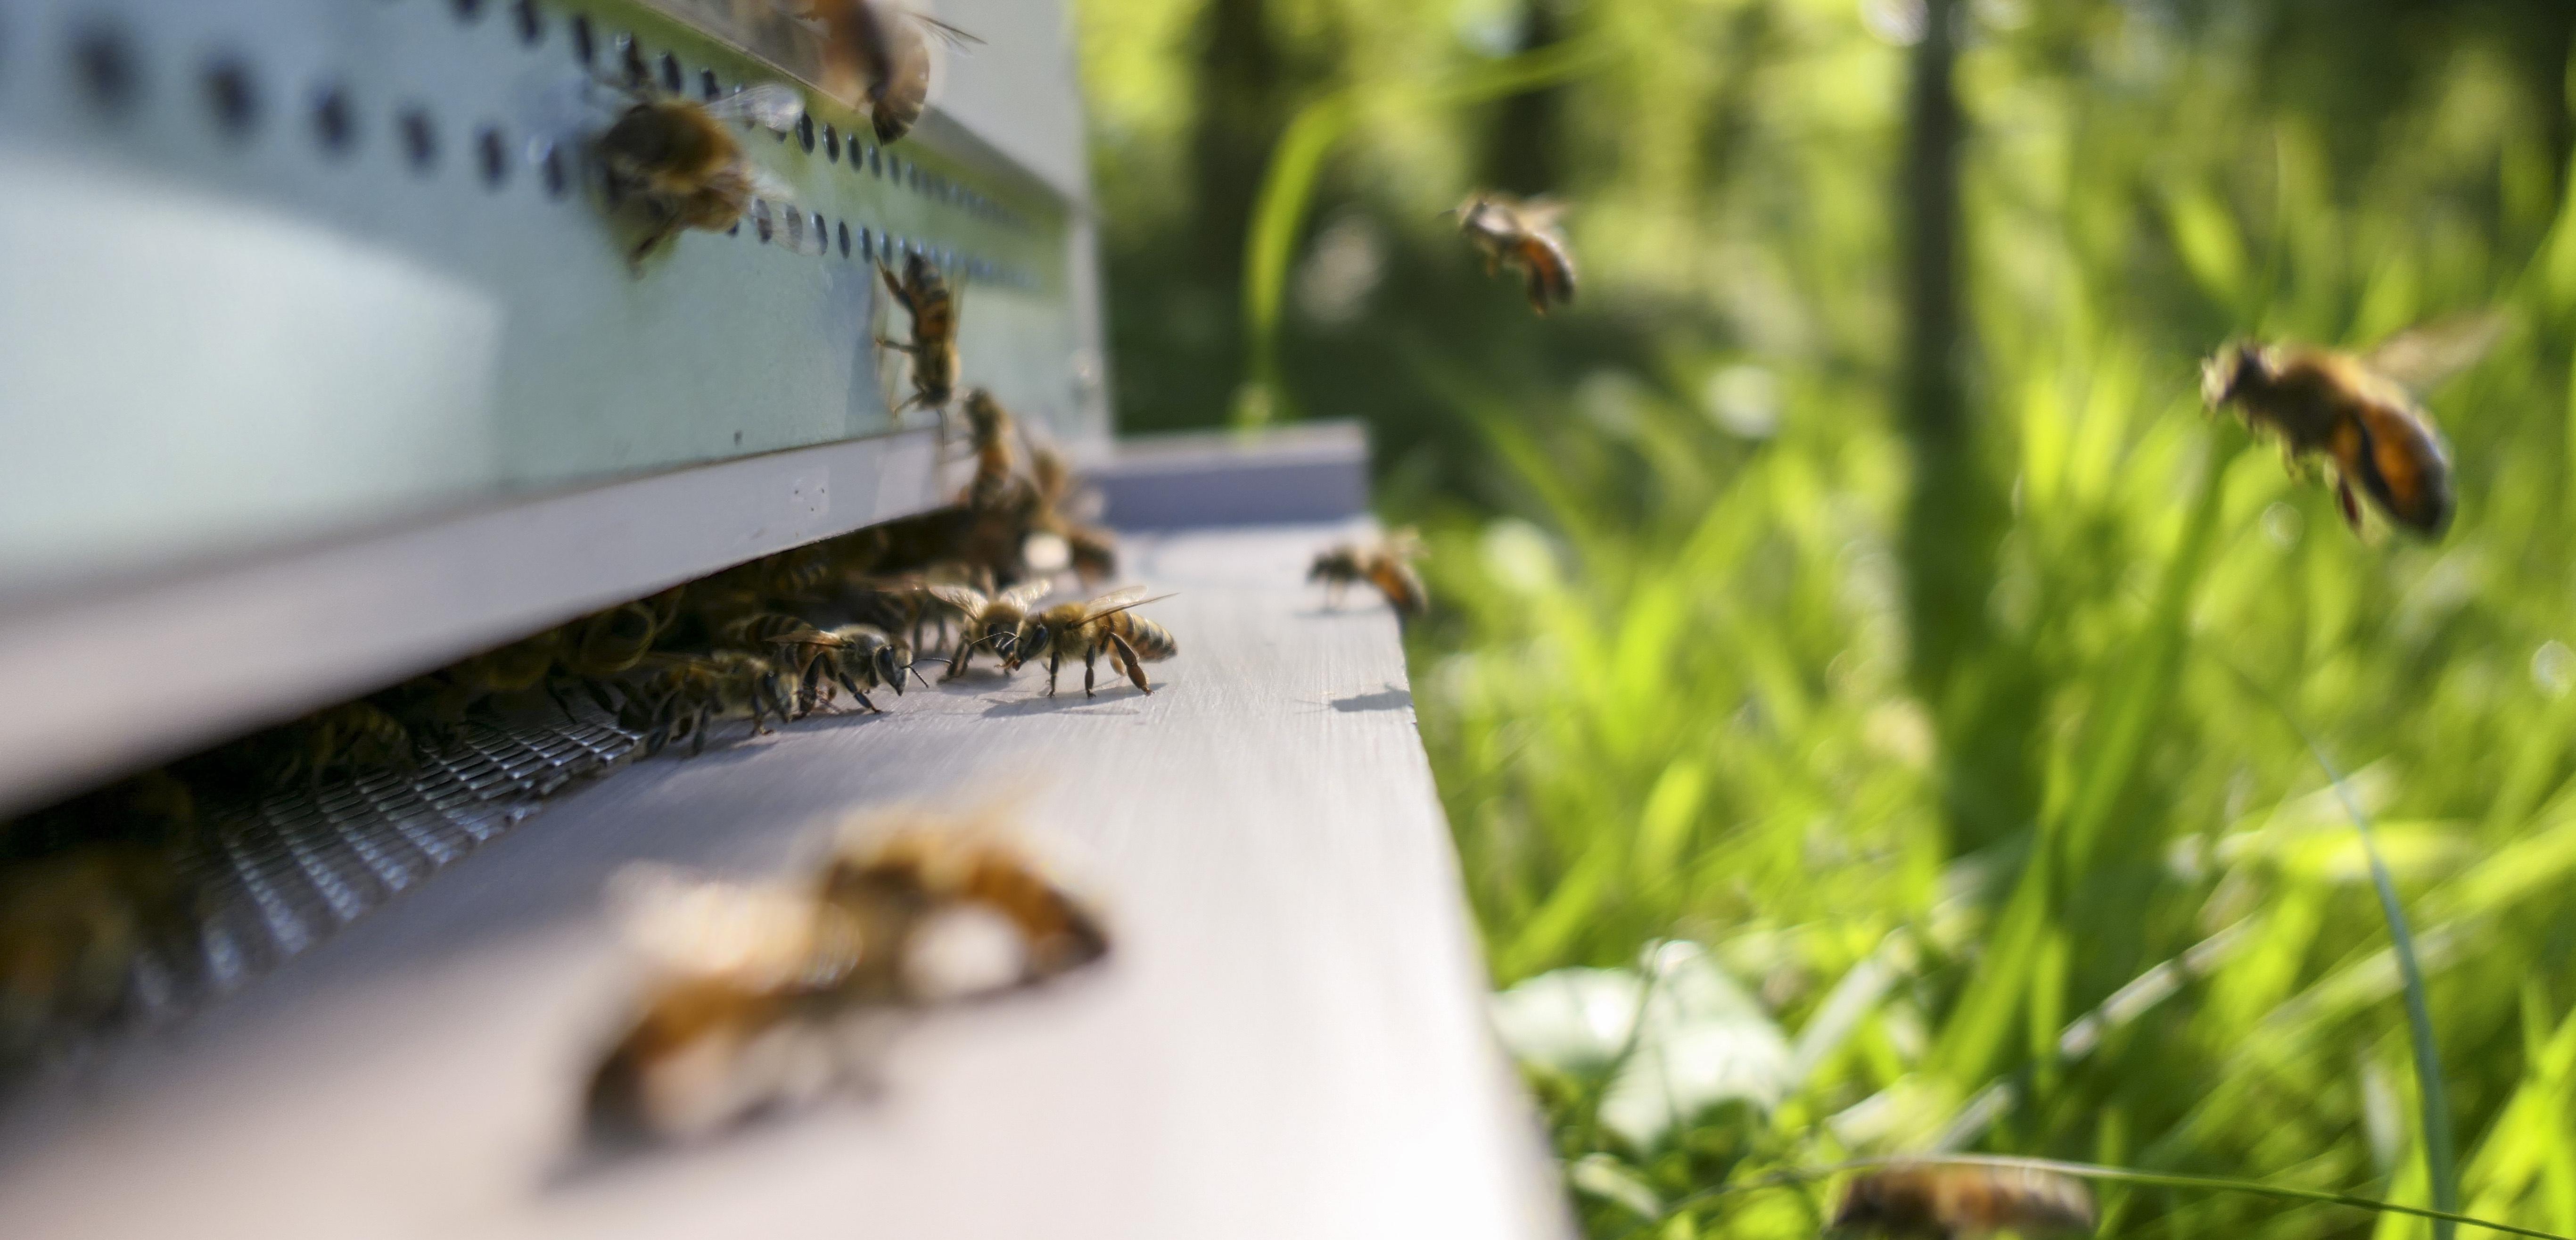 Buckfast Honey Bees Entering The Hive